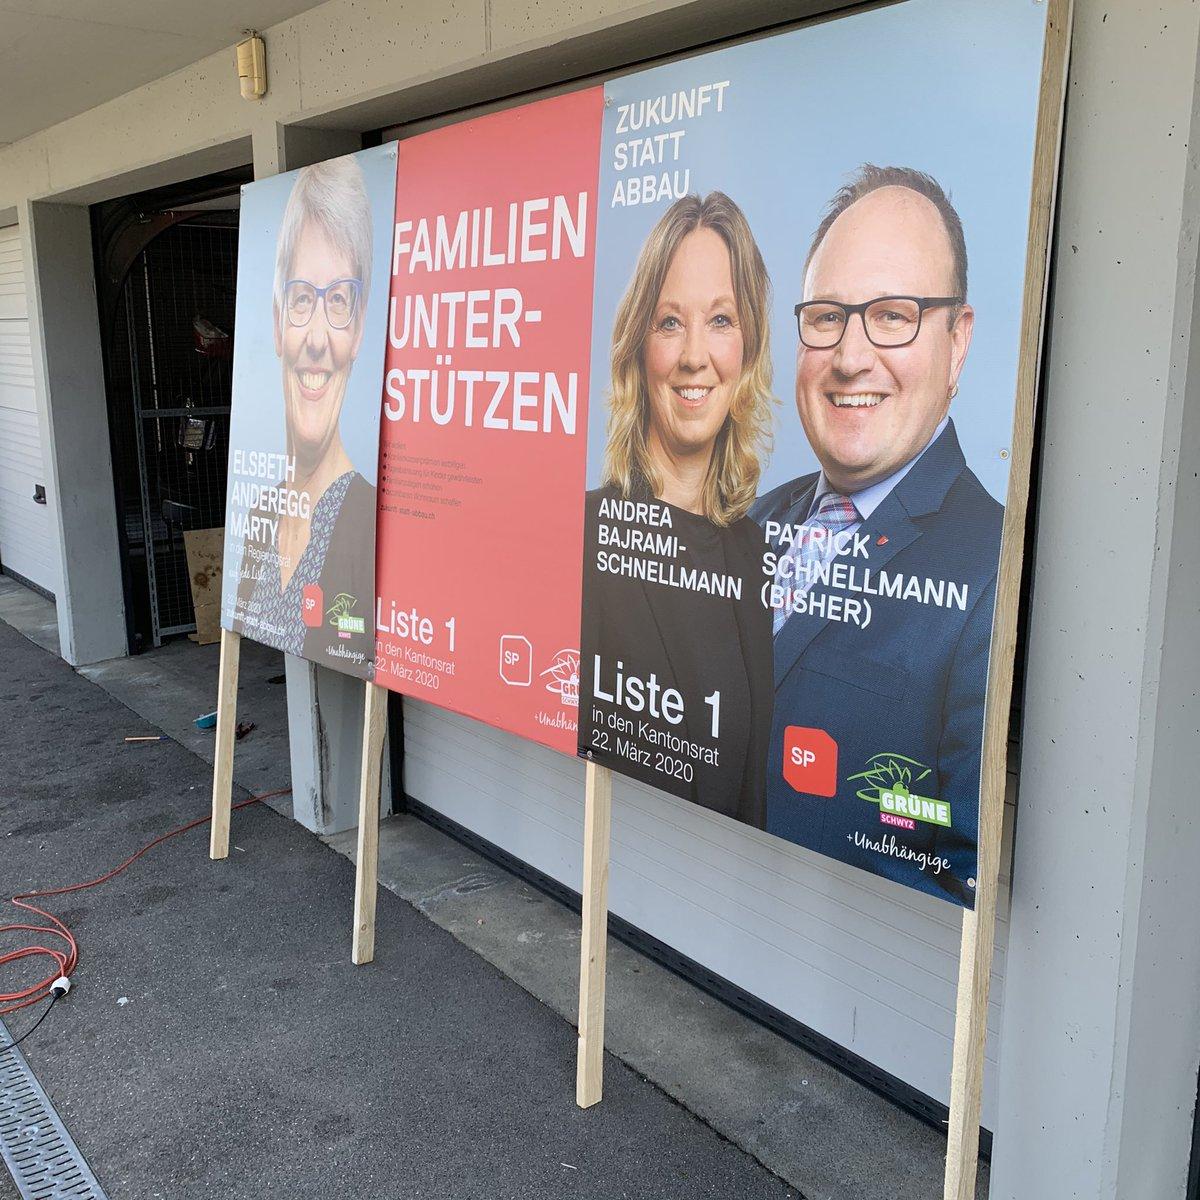 Wahlplakate montieren für den Wahlkampf #wahlkampf #wahlkampf2020 #kantonsrat #kantonschwyz #parlament #politik #spwangensz #wangensz @sp_schwyzpic.twitter.com/rLnchyDkbP